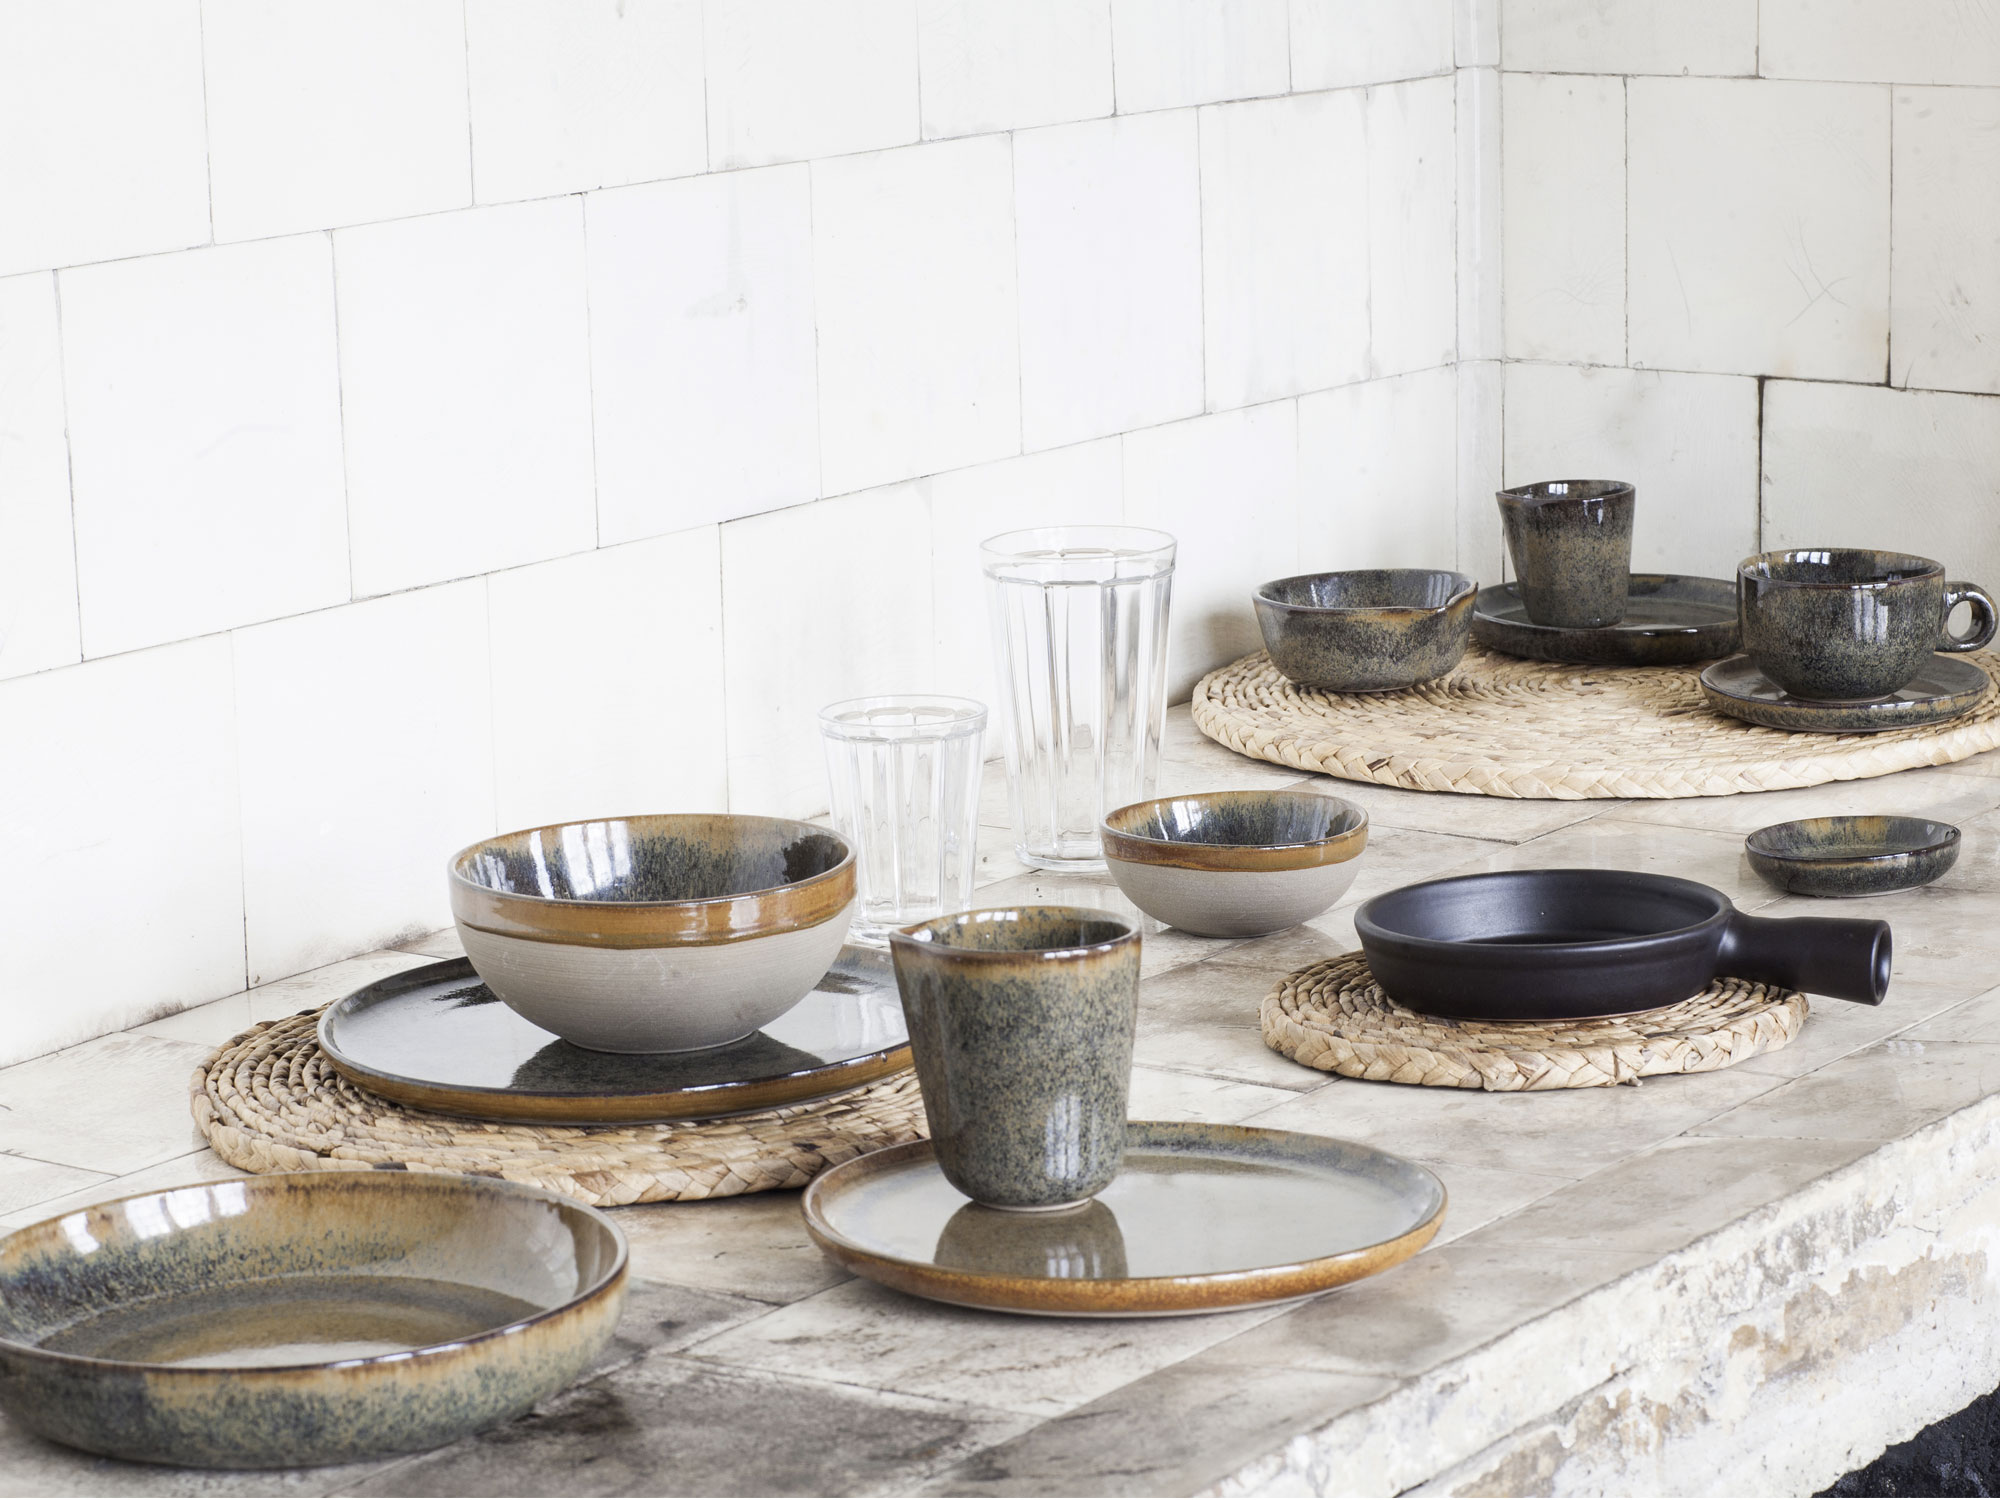 sergio herman en serax lanceren de tafelcollectie surface. Black Bedroom Furniture Sets. Home Design Ideas